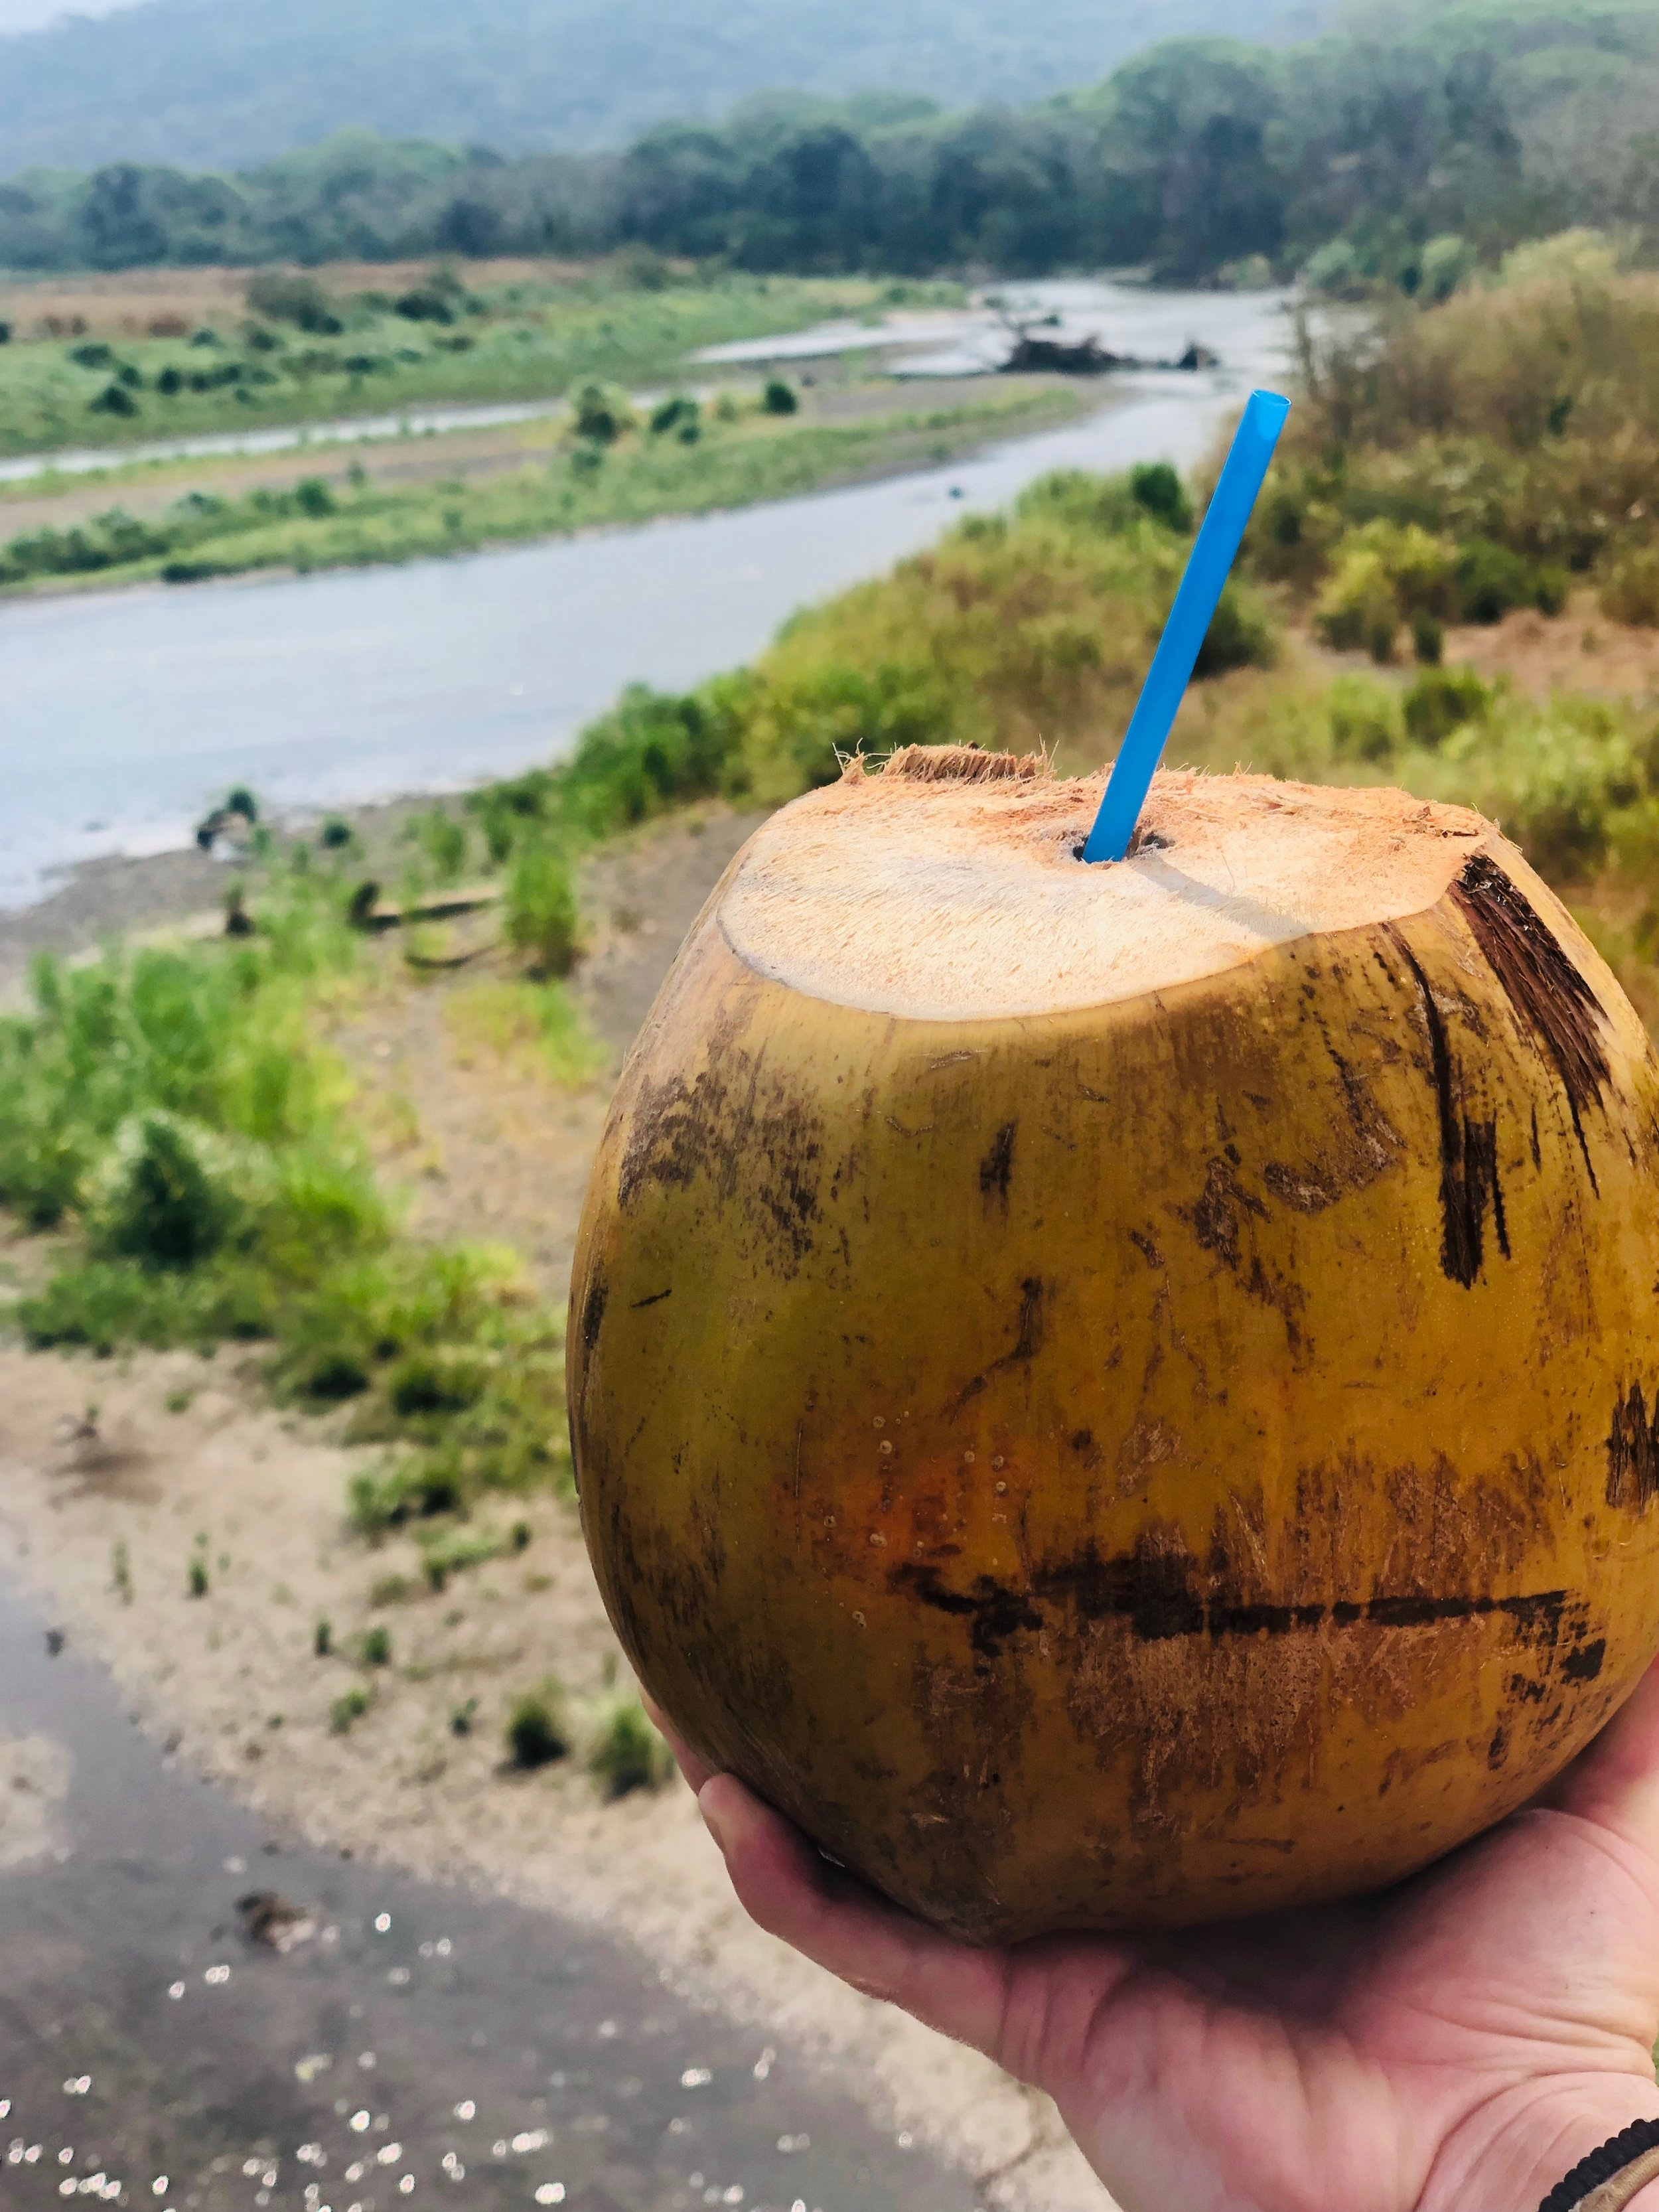 Coconut Time at Crocodile Bridge